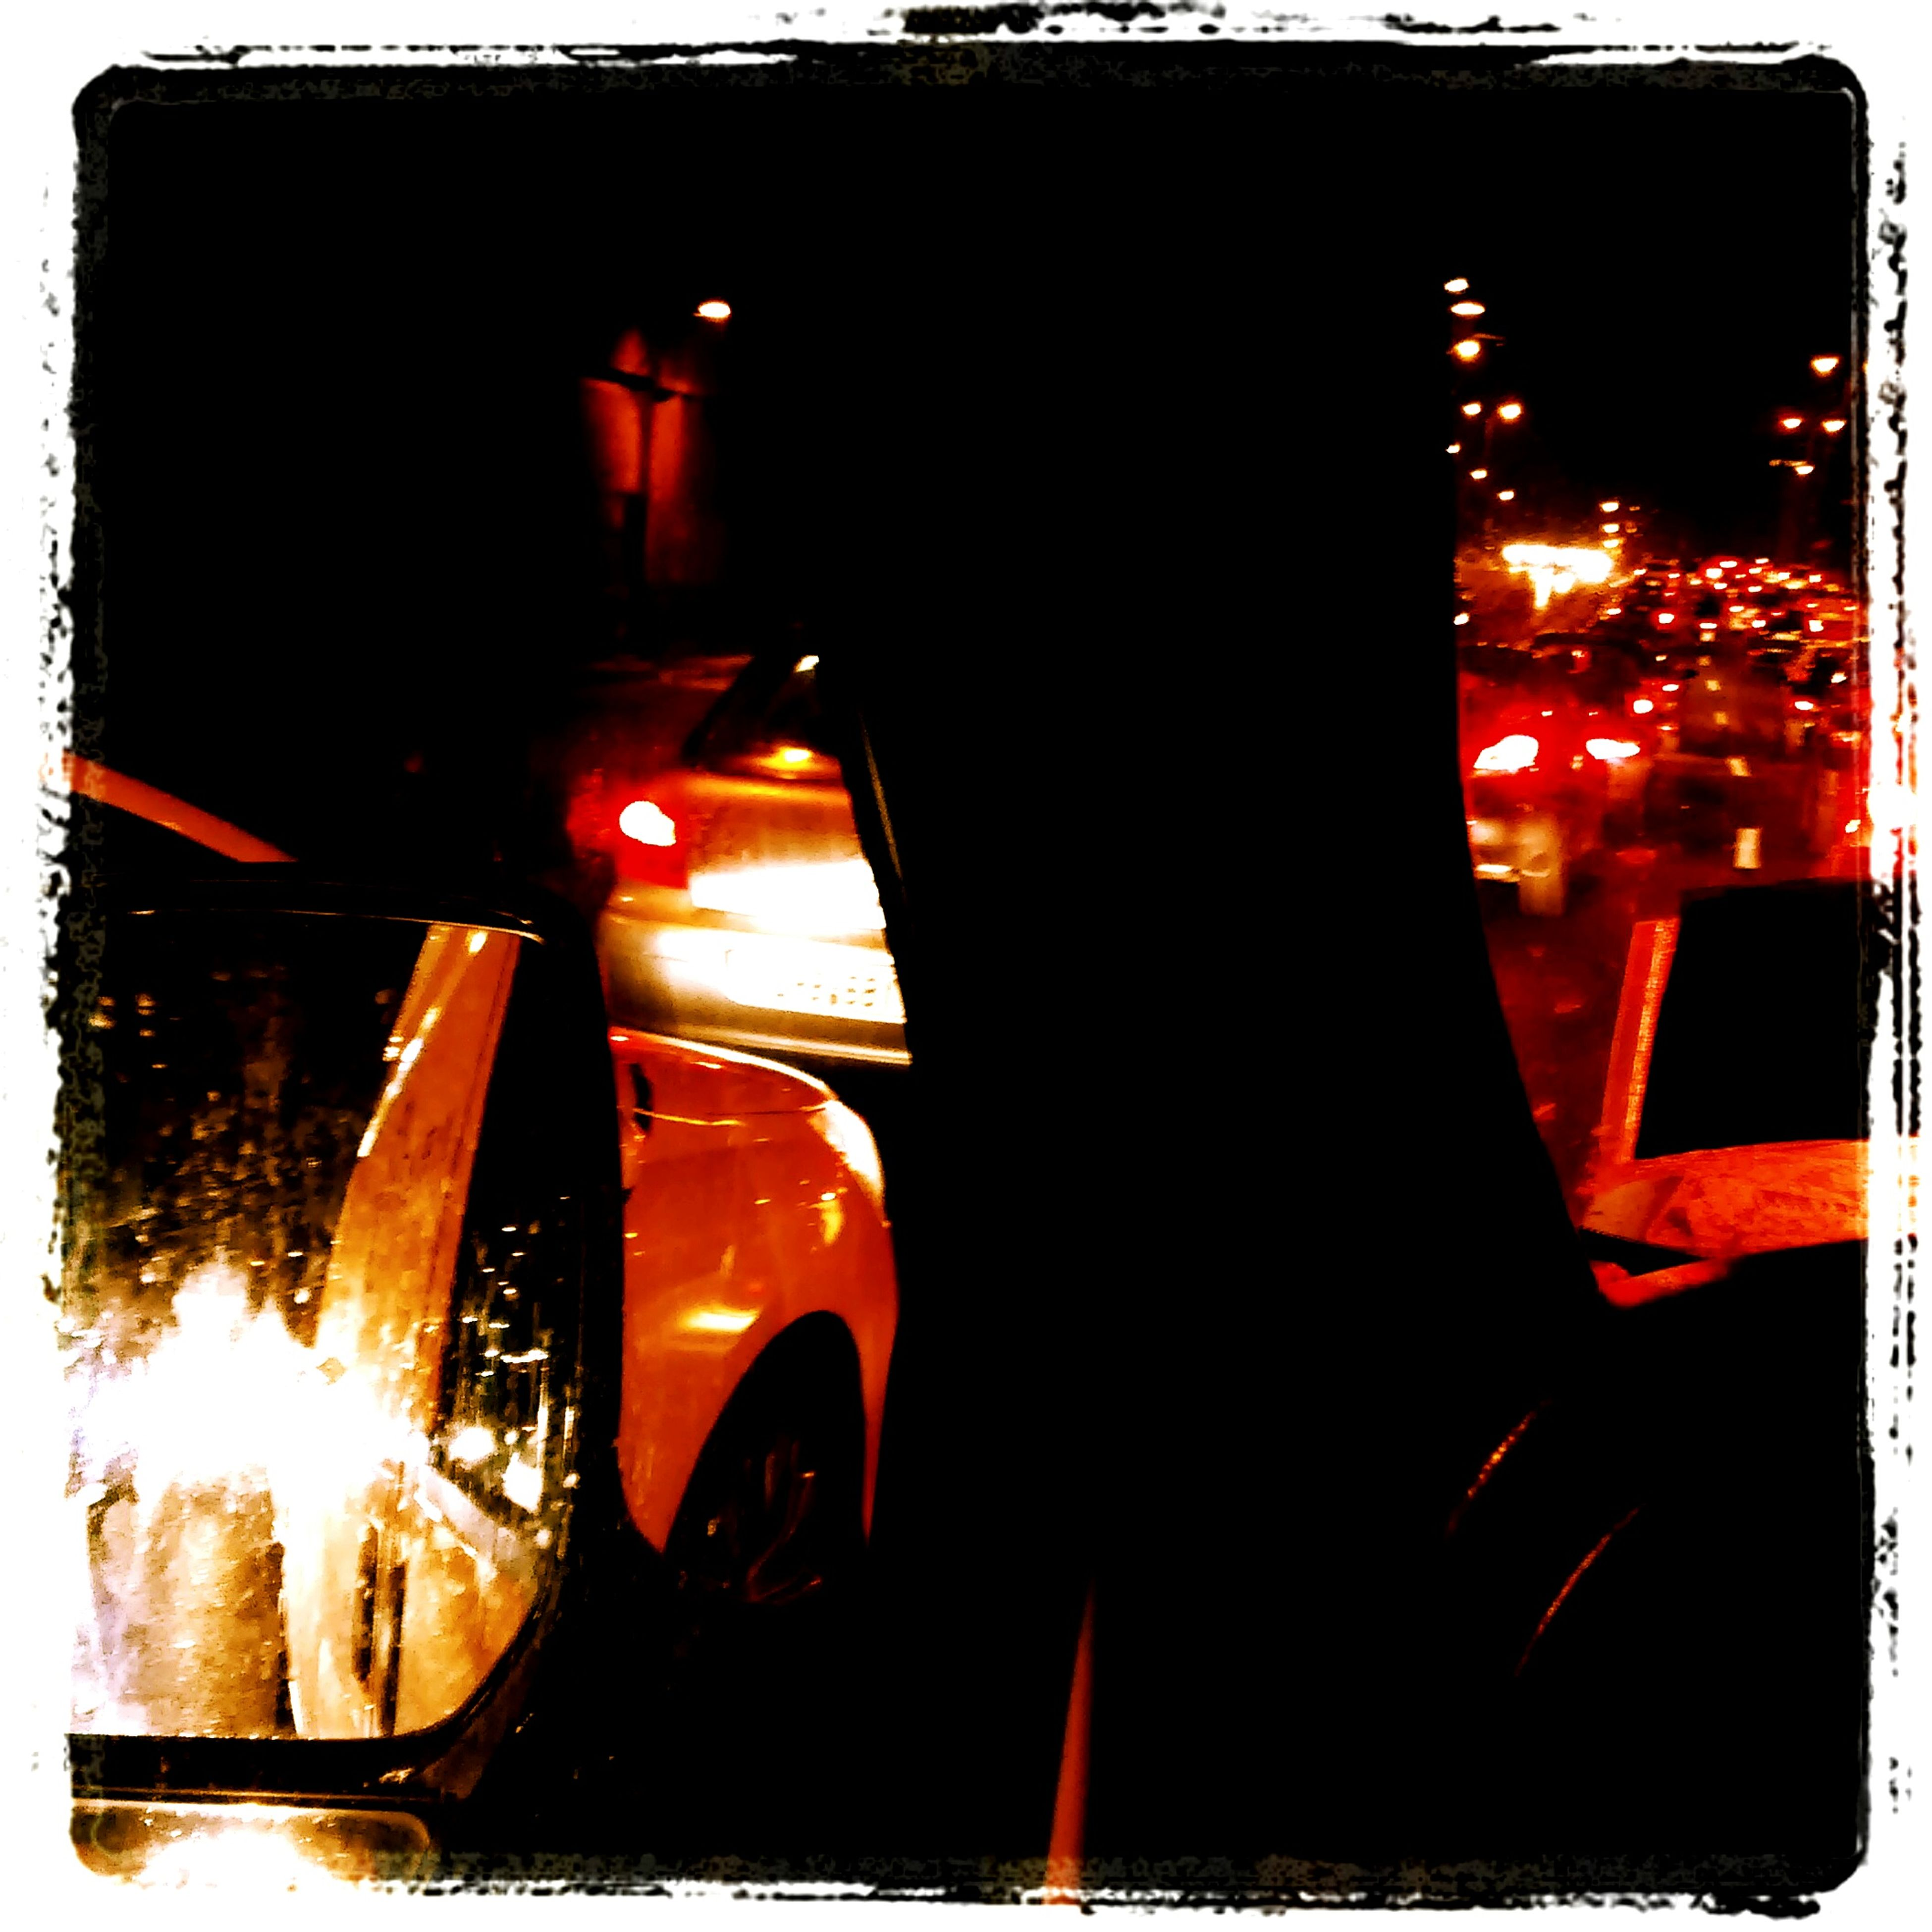 illuminated, night, car, transportation, land vehicle, mode of transport, transfer print, street, street light, building exterior, auto post production filter, lighting equipment, headlight, glass - material, built structure, architecture, road, light - natural phenomenon, window, city